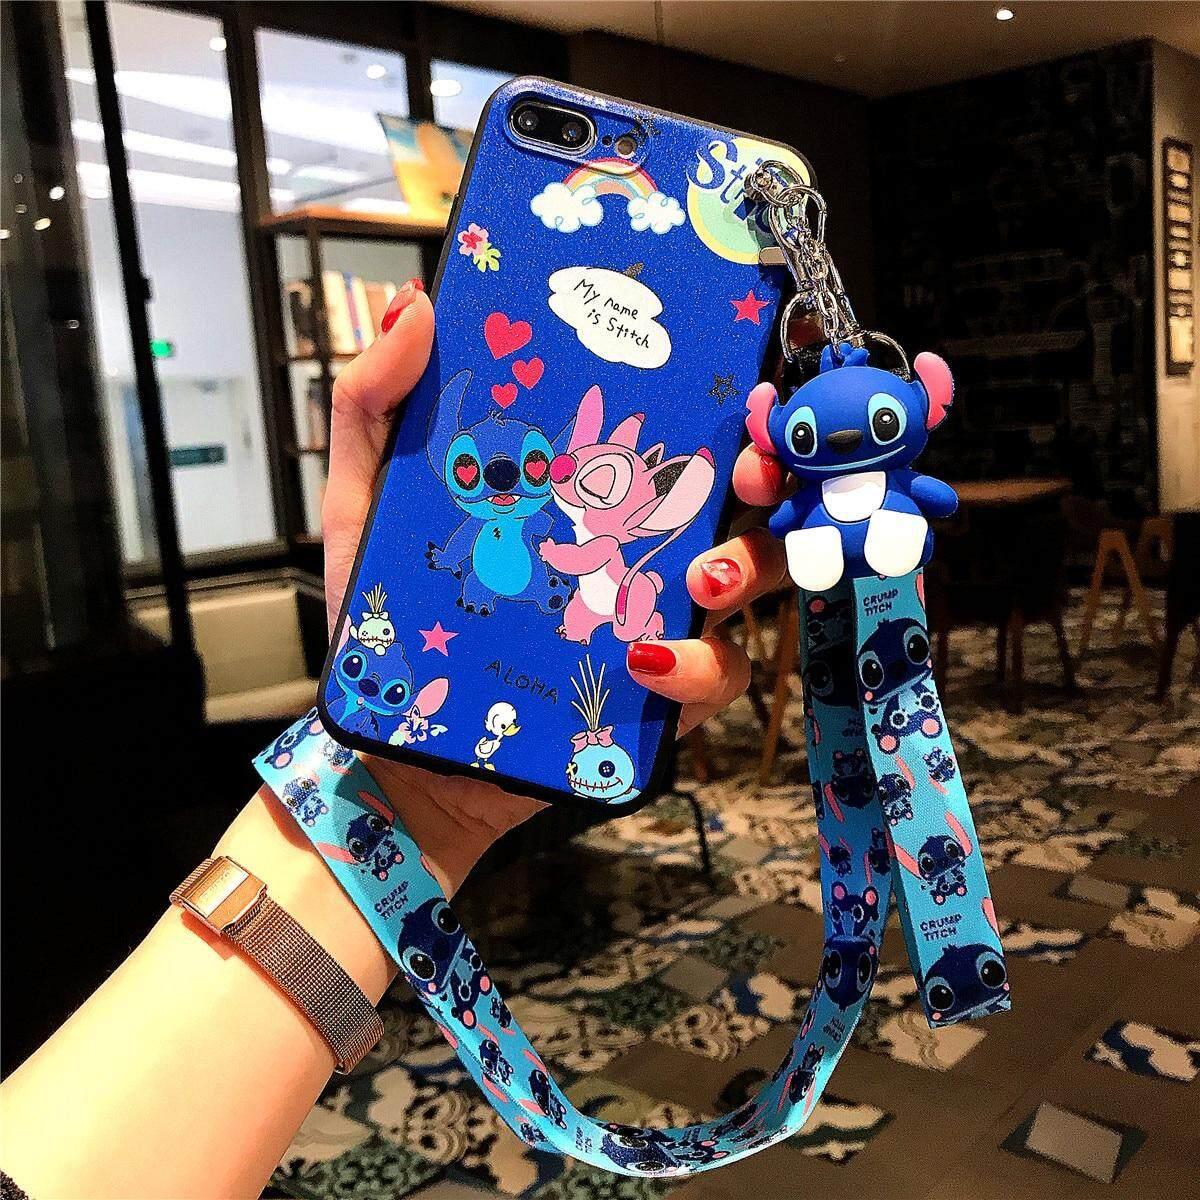 Lucu Stitch 3D Boneka Kartun Casing Braket Ponsel Untuk IPhone 6 6 S 6 Plus 6 S Plus 7 8 7 Plus X X X Max XR 11 11 Pro 11 Pro Max TPU Penutup